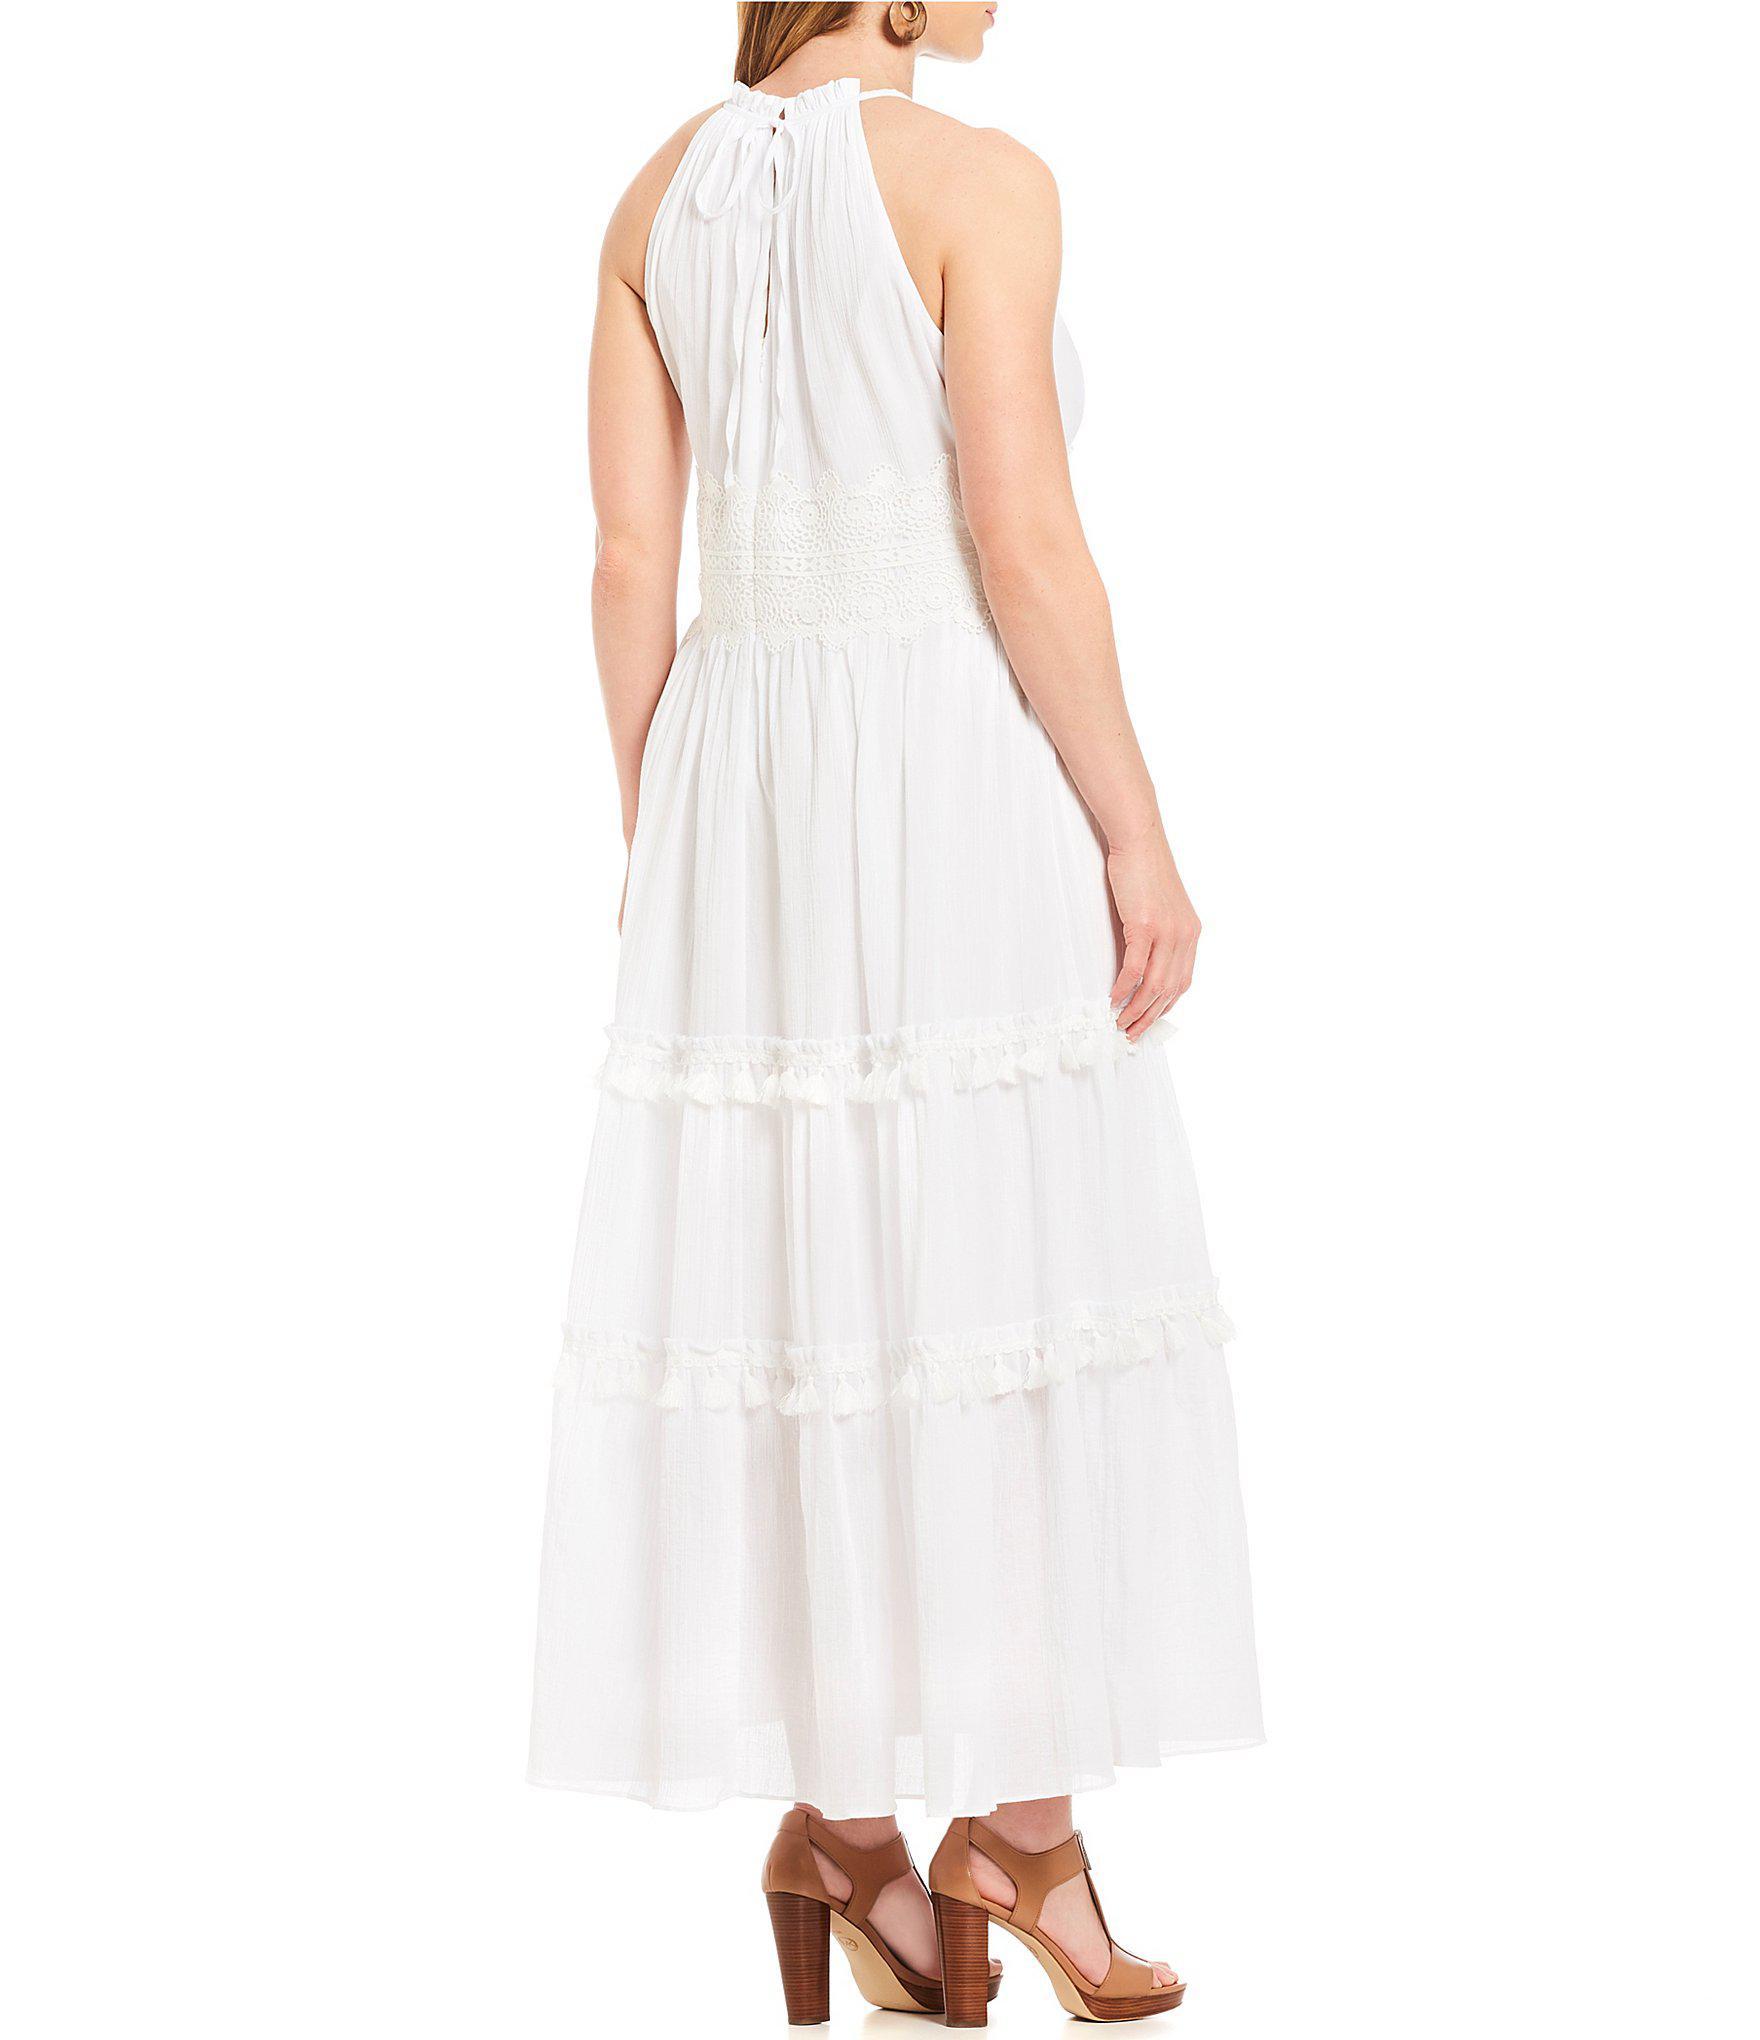 d29a04f4367 Lyst - Eliza J Plus Size Lace Waist Halter Maxi Dress in White